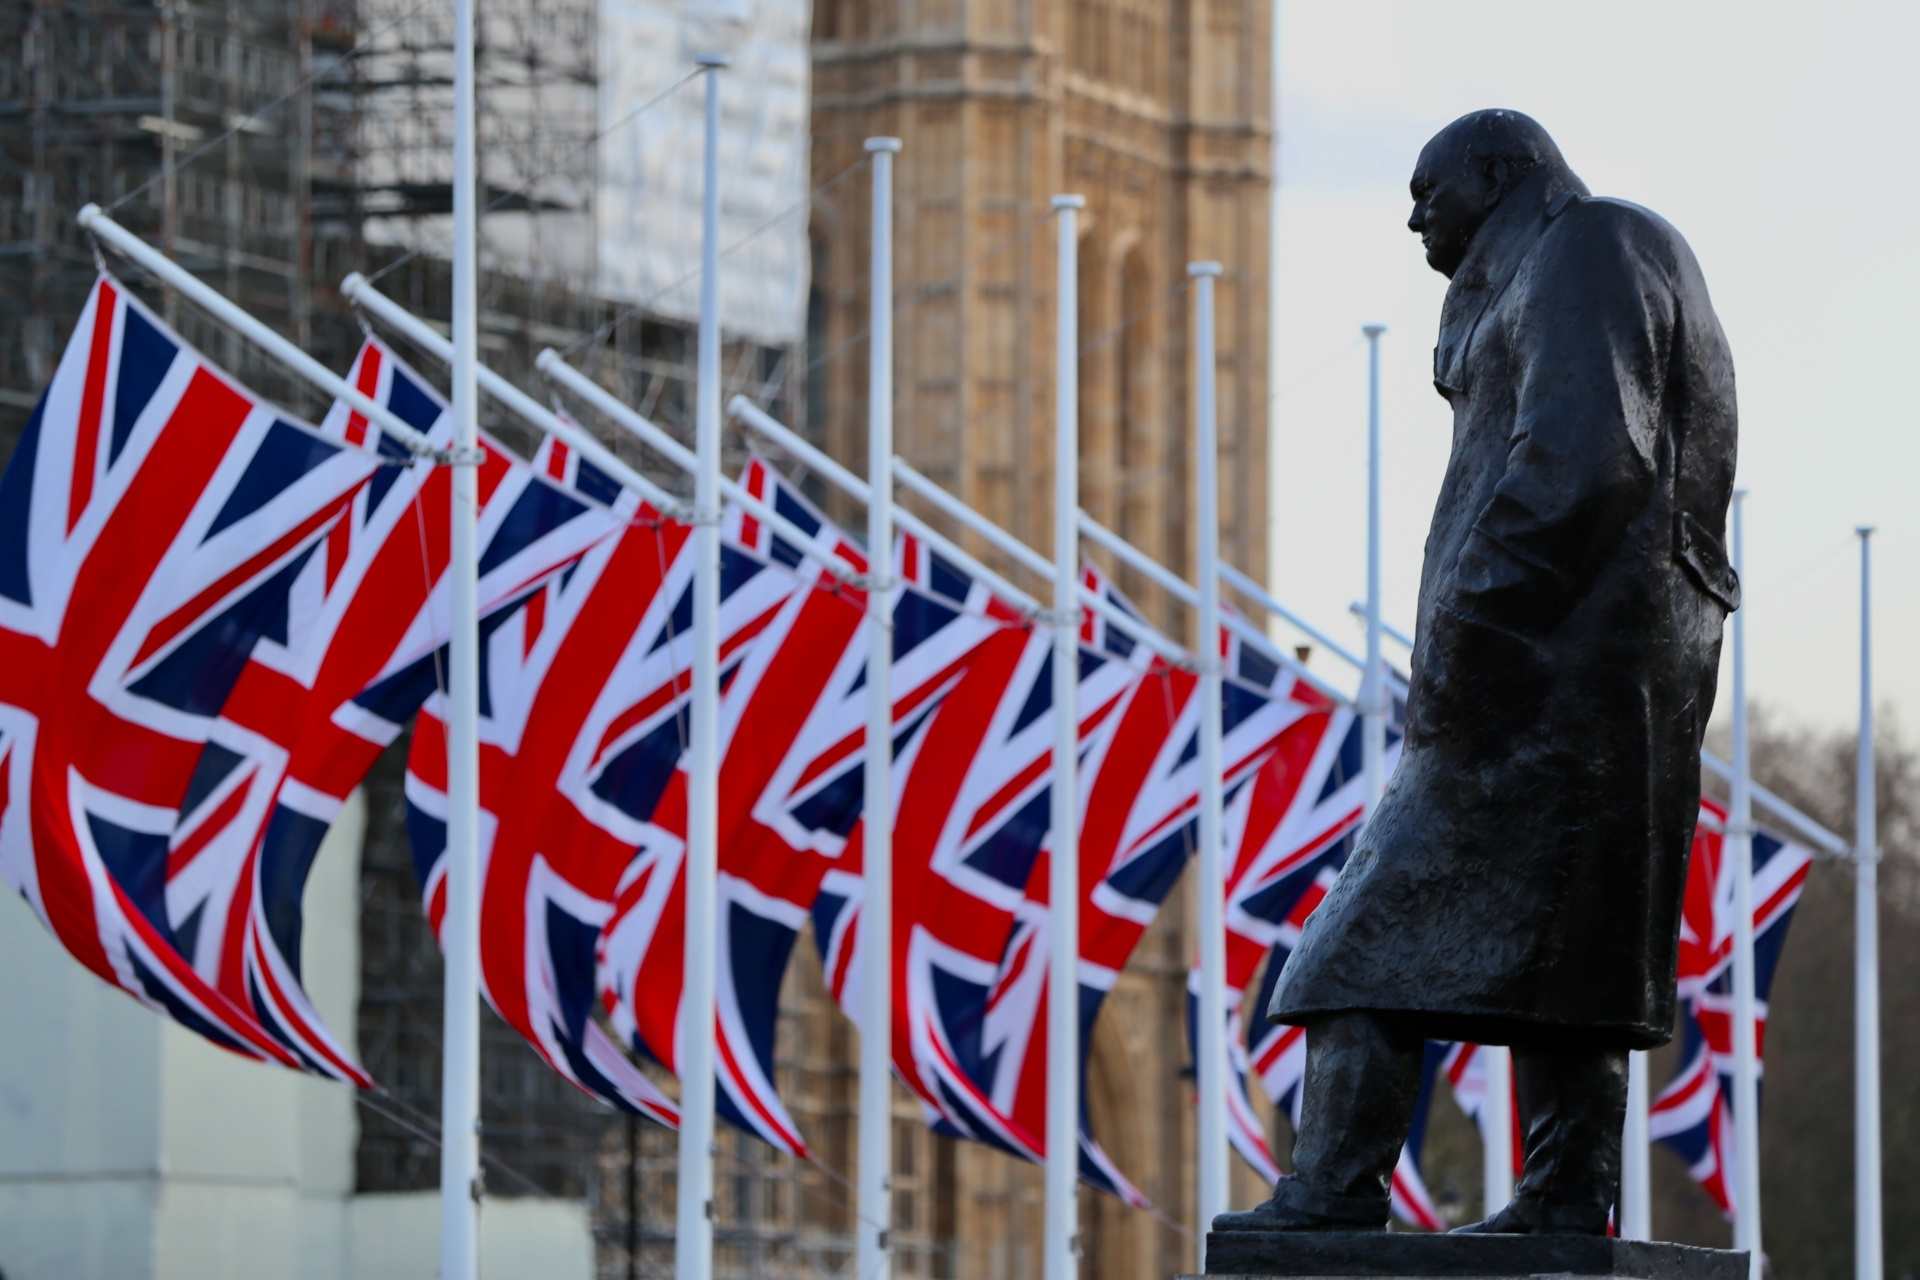 Winston Churchill near the English flag